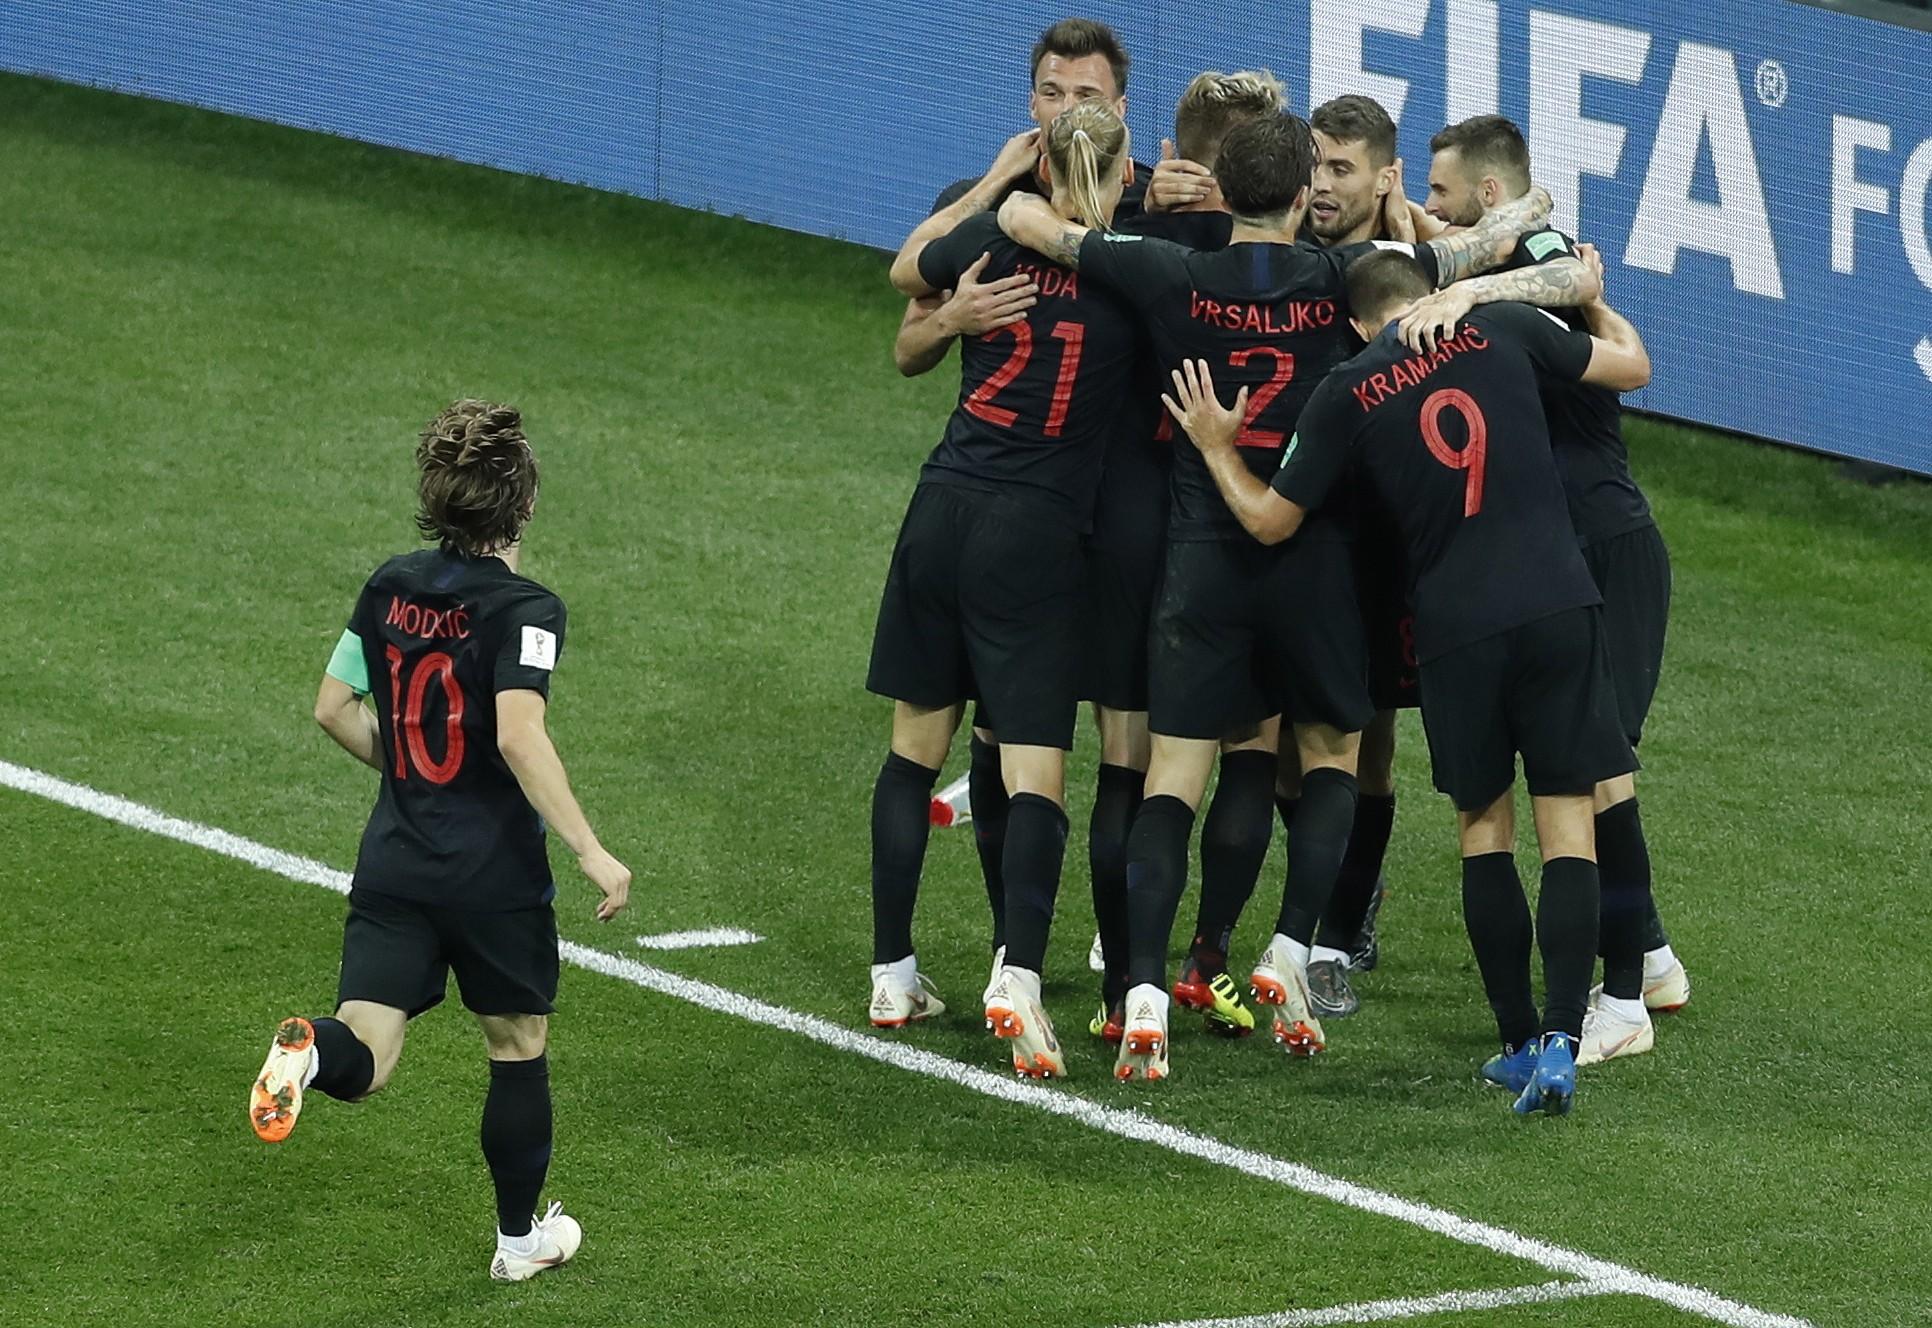 Mundial 2018 Croácia